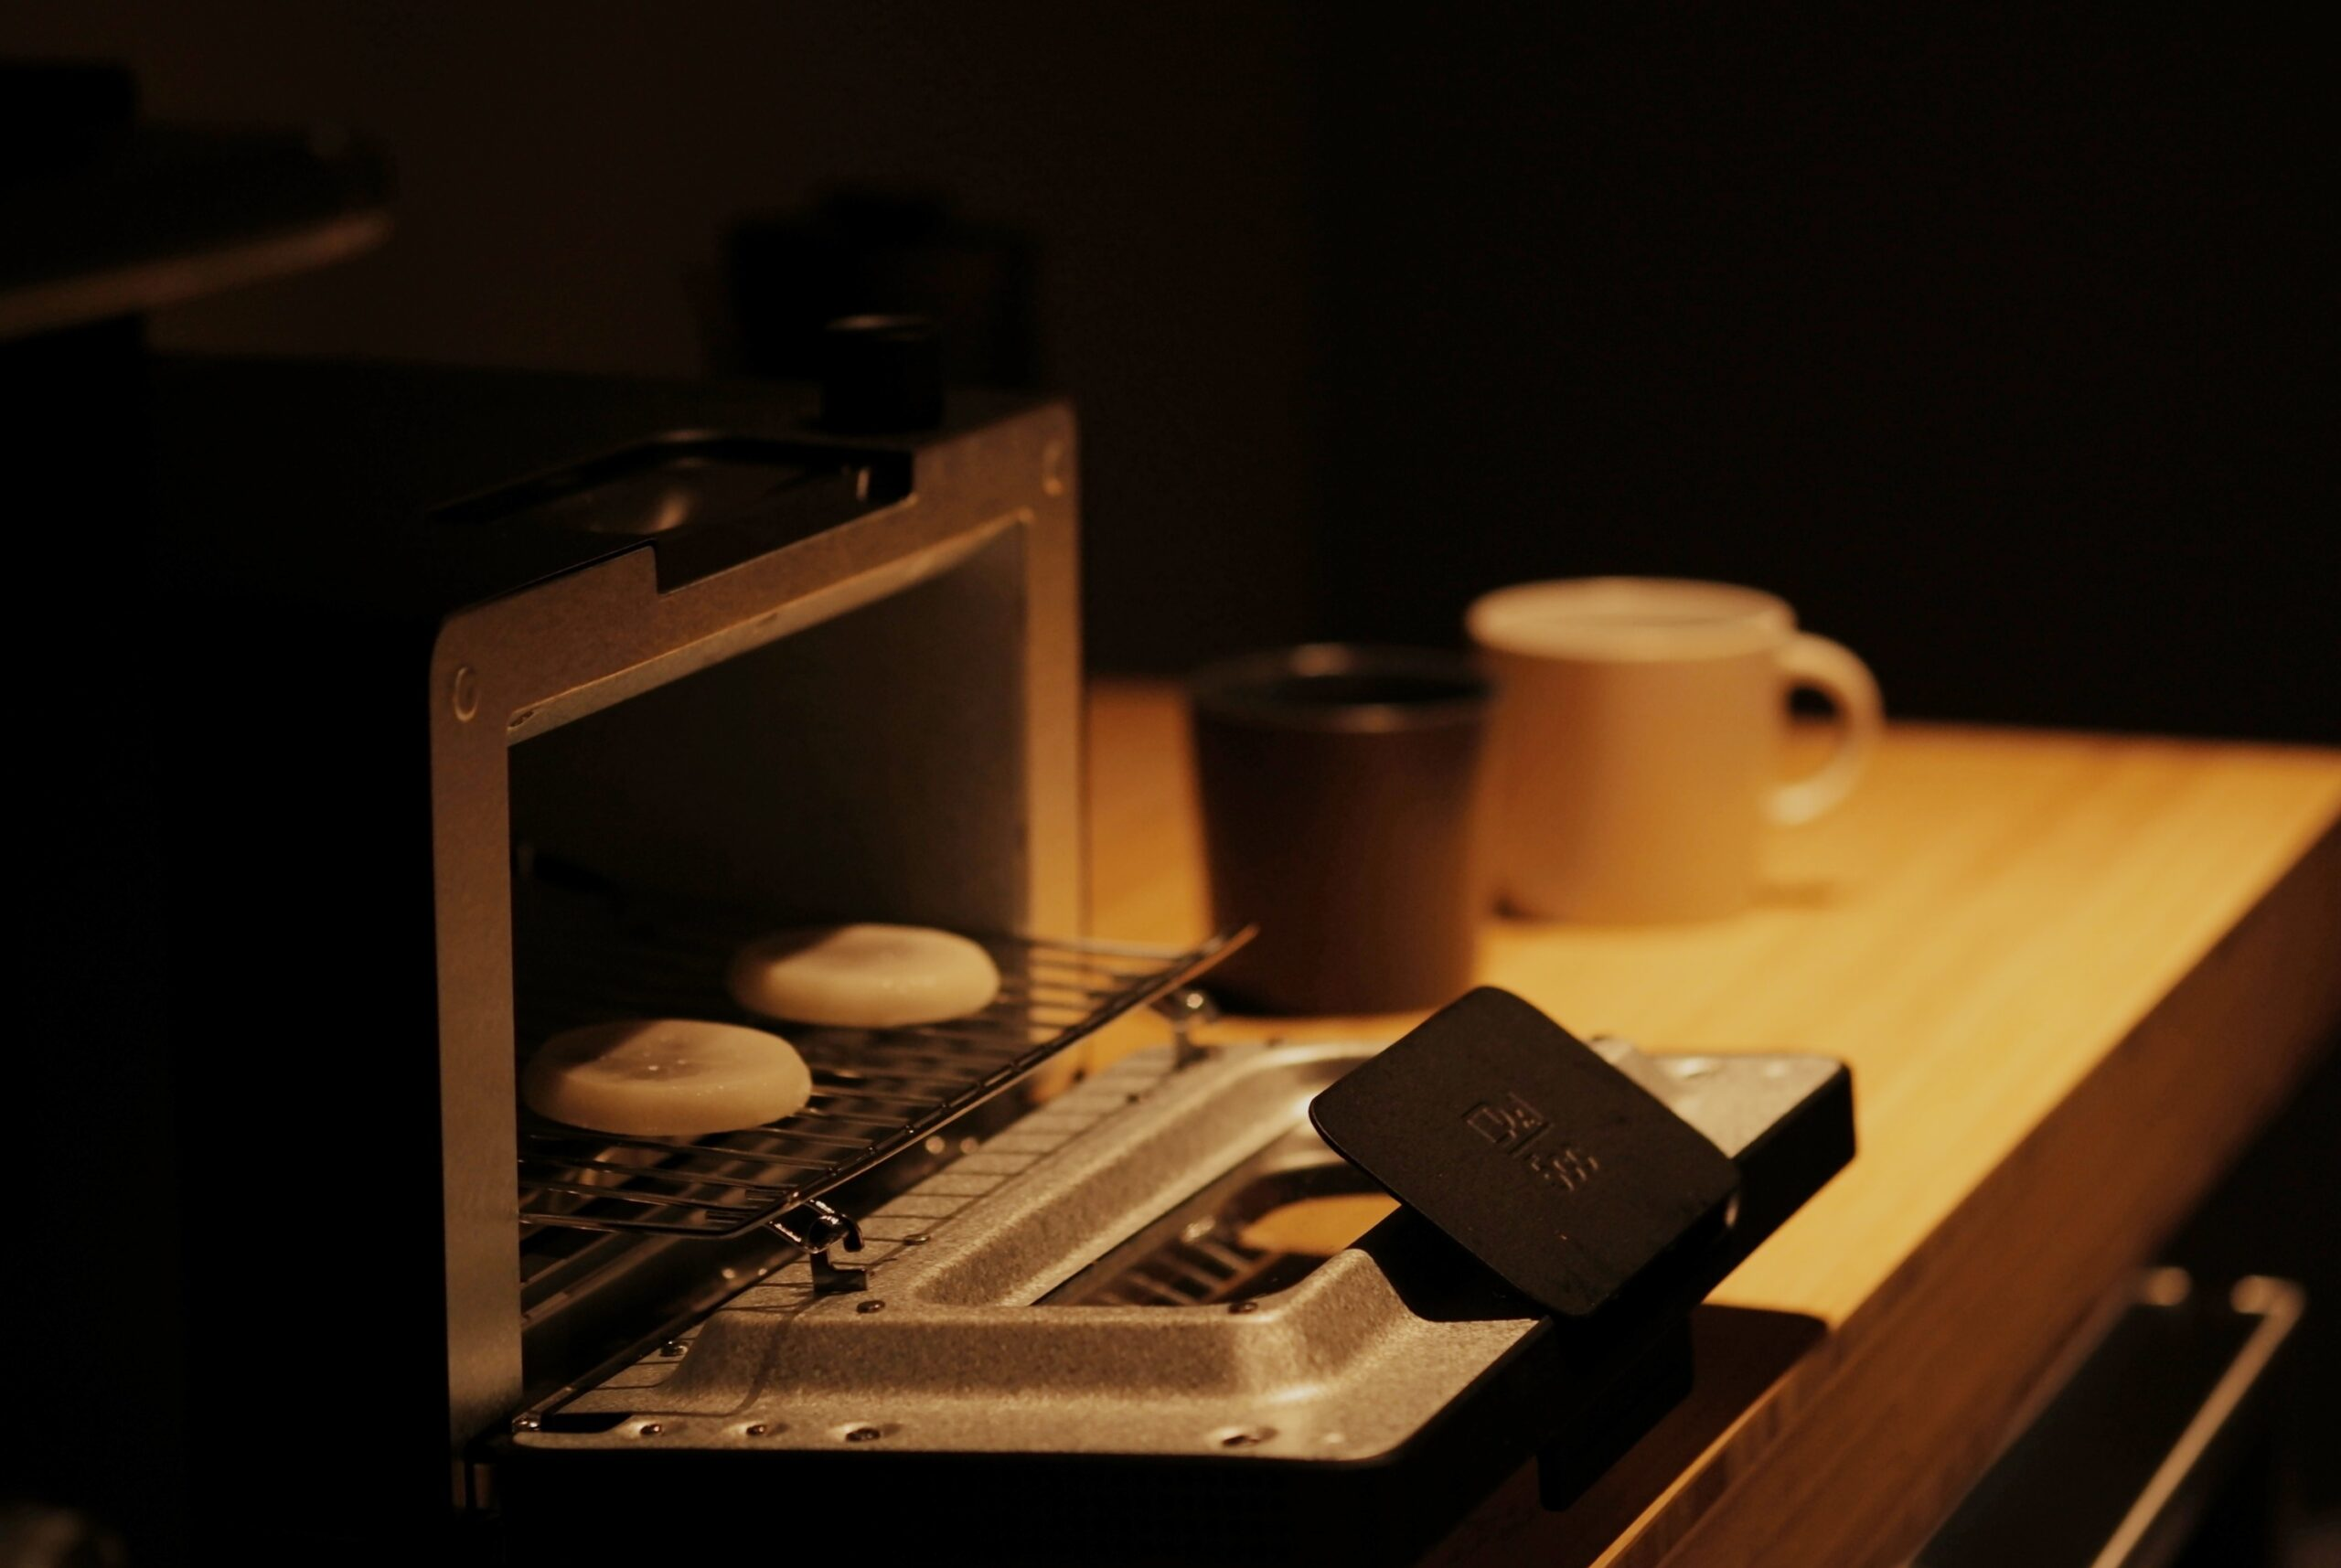 BALMUDAが使えるシェアキッチン #5